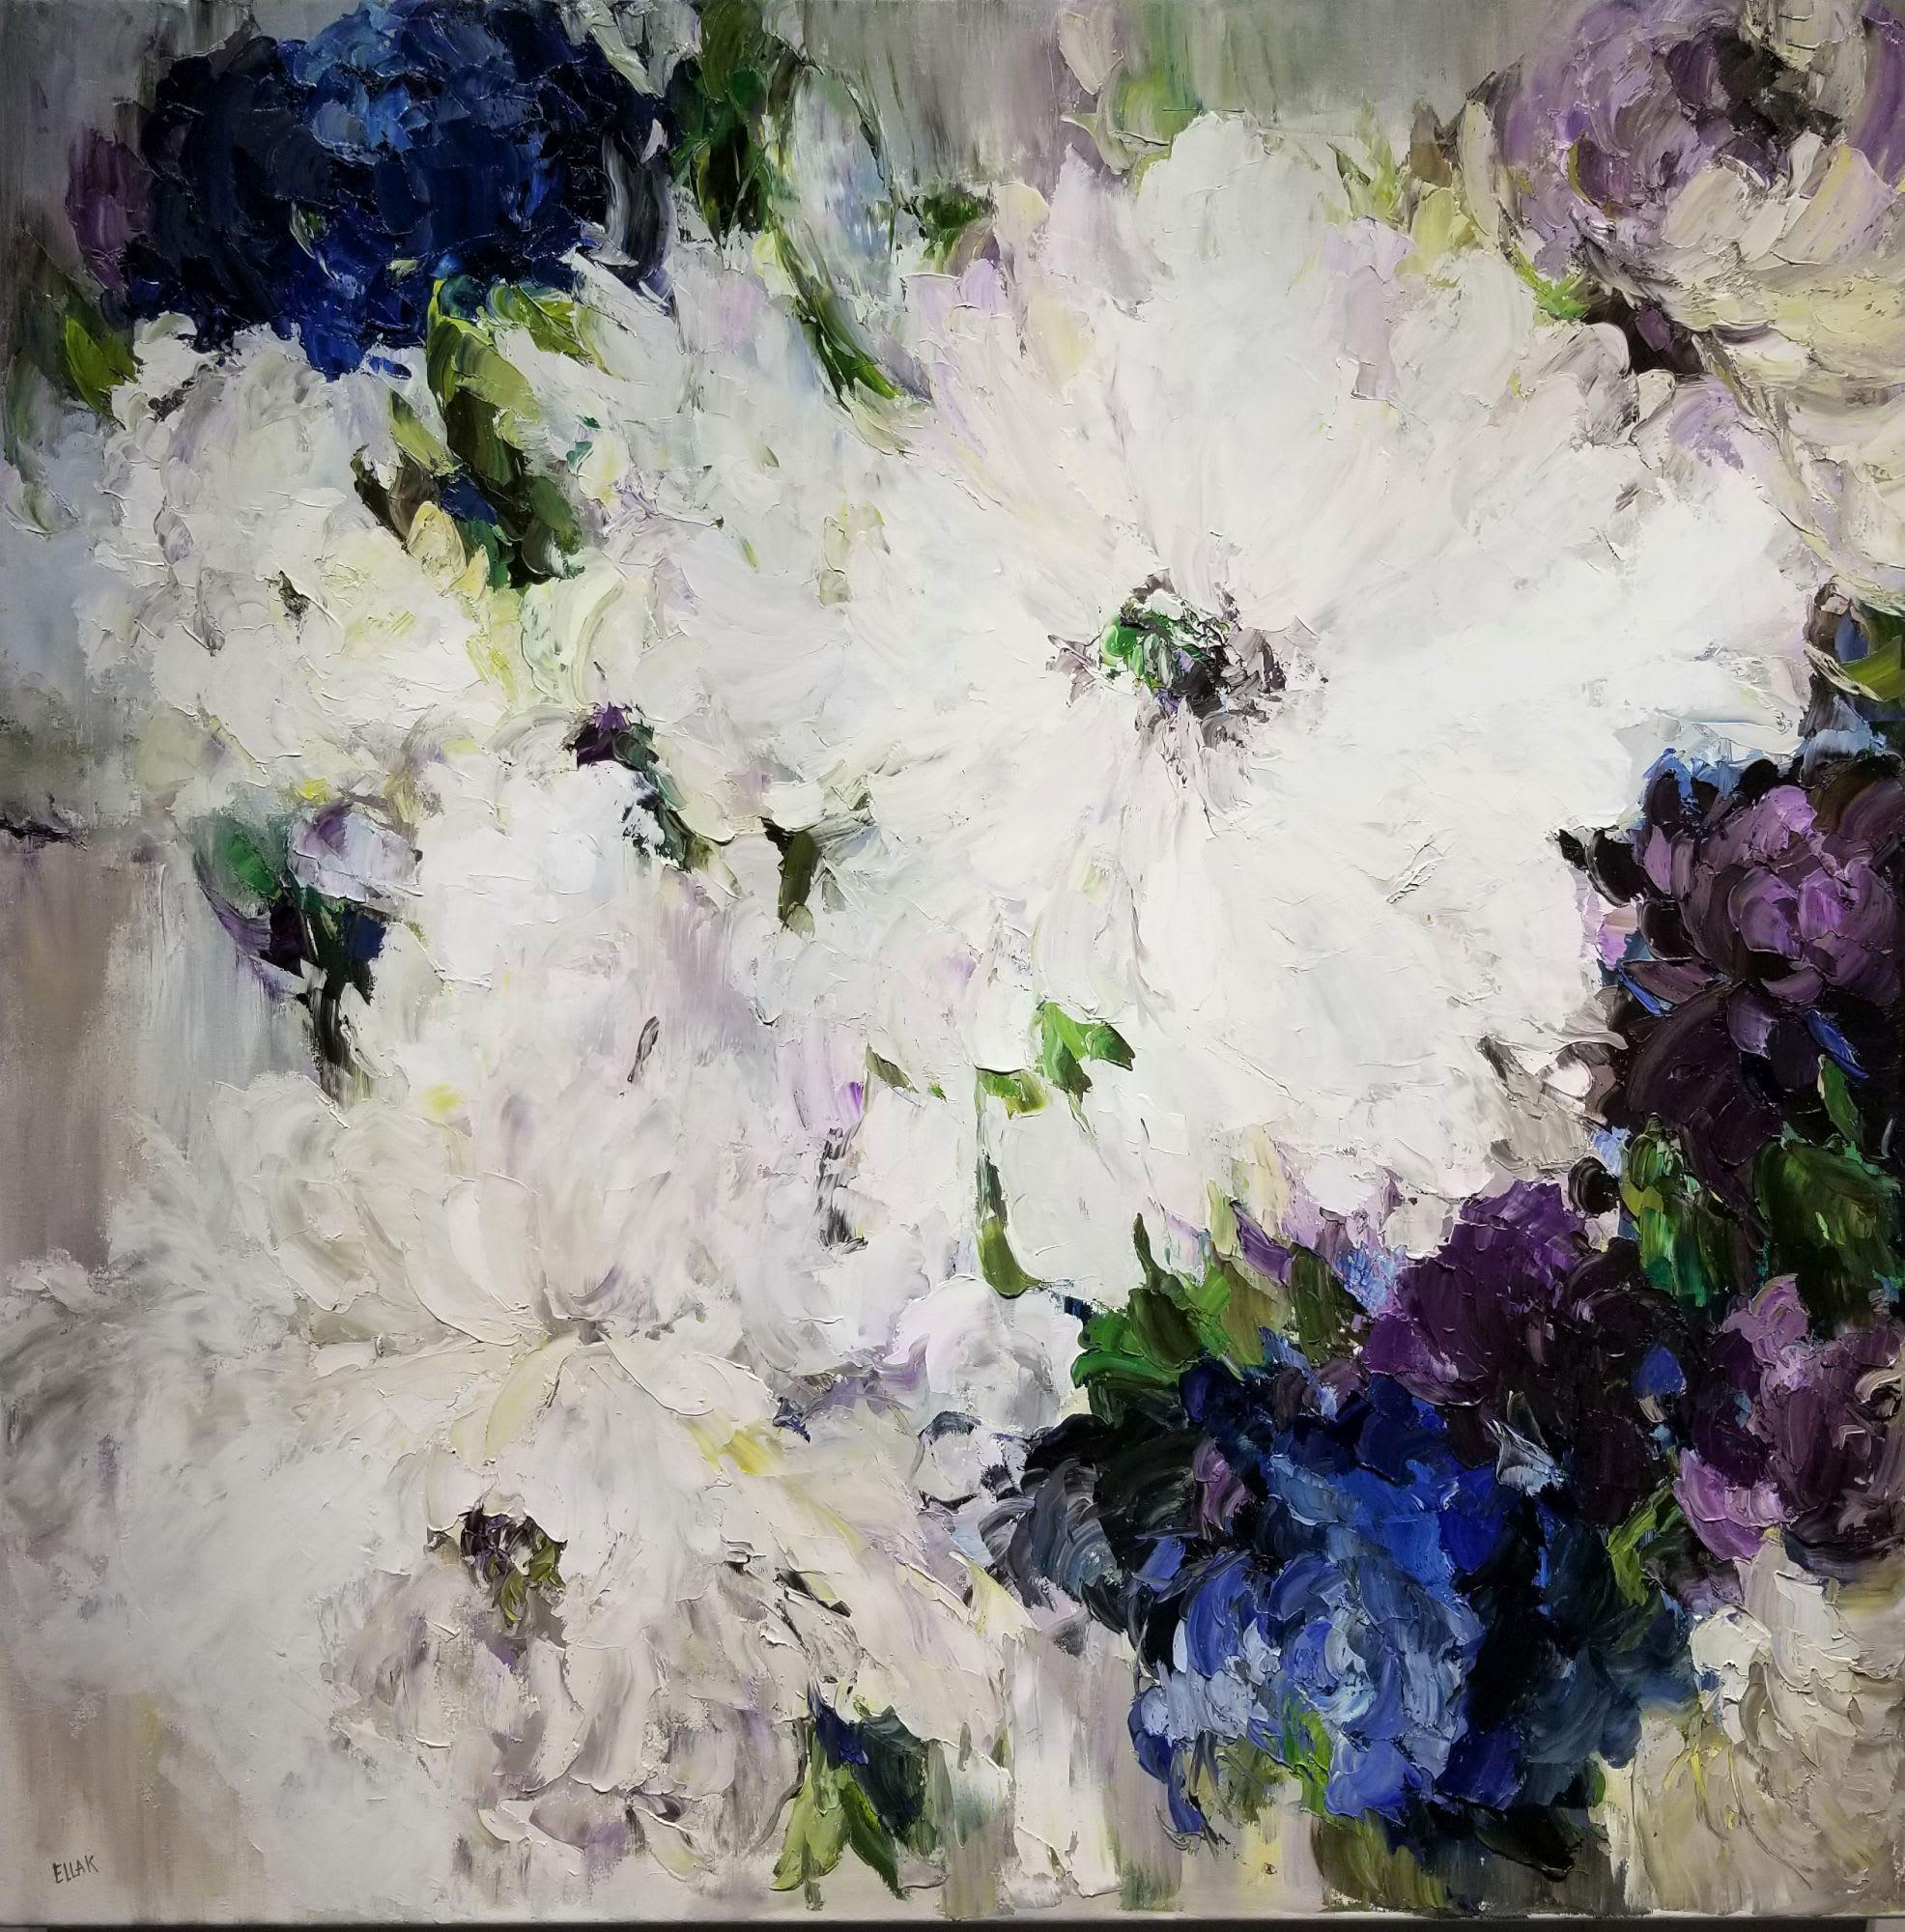 'Blue Peonia III' by Ella K at Gallery 133